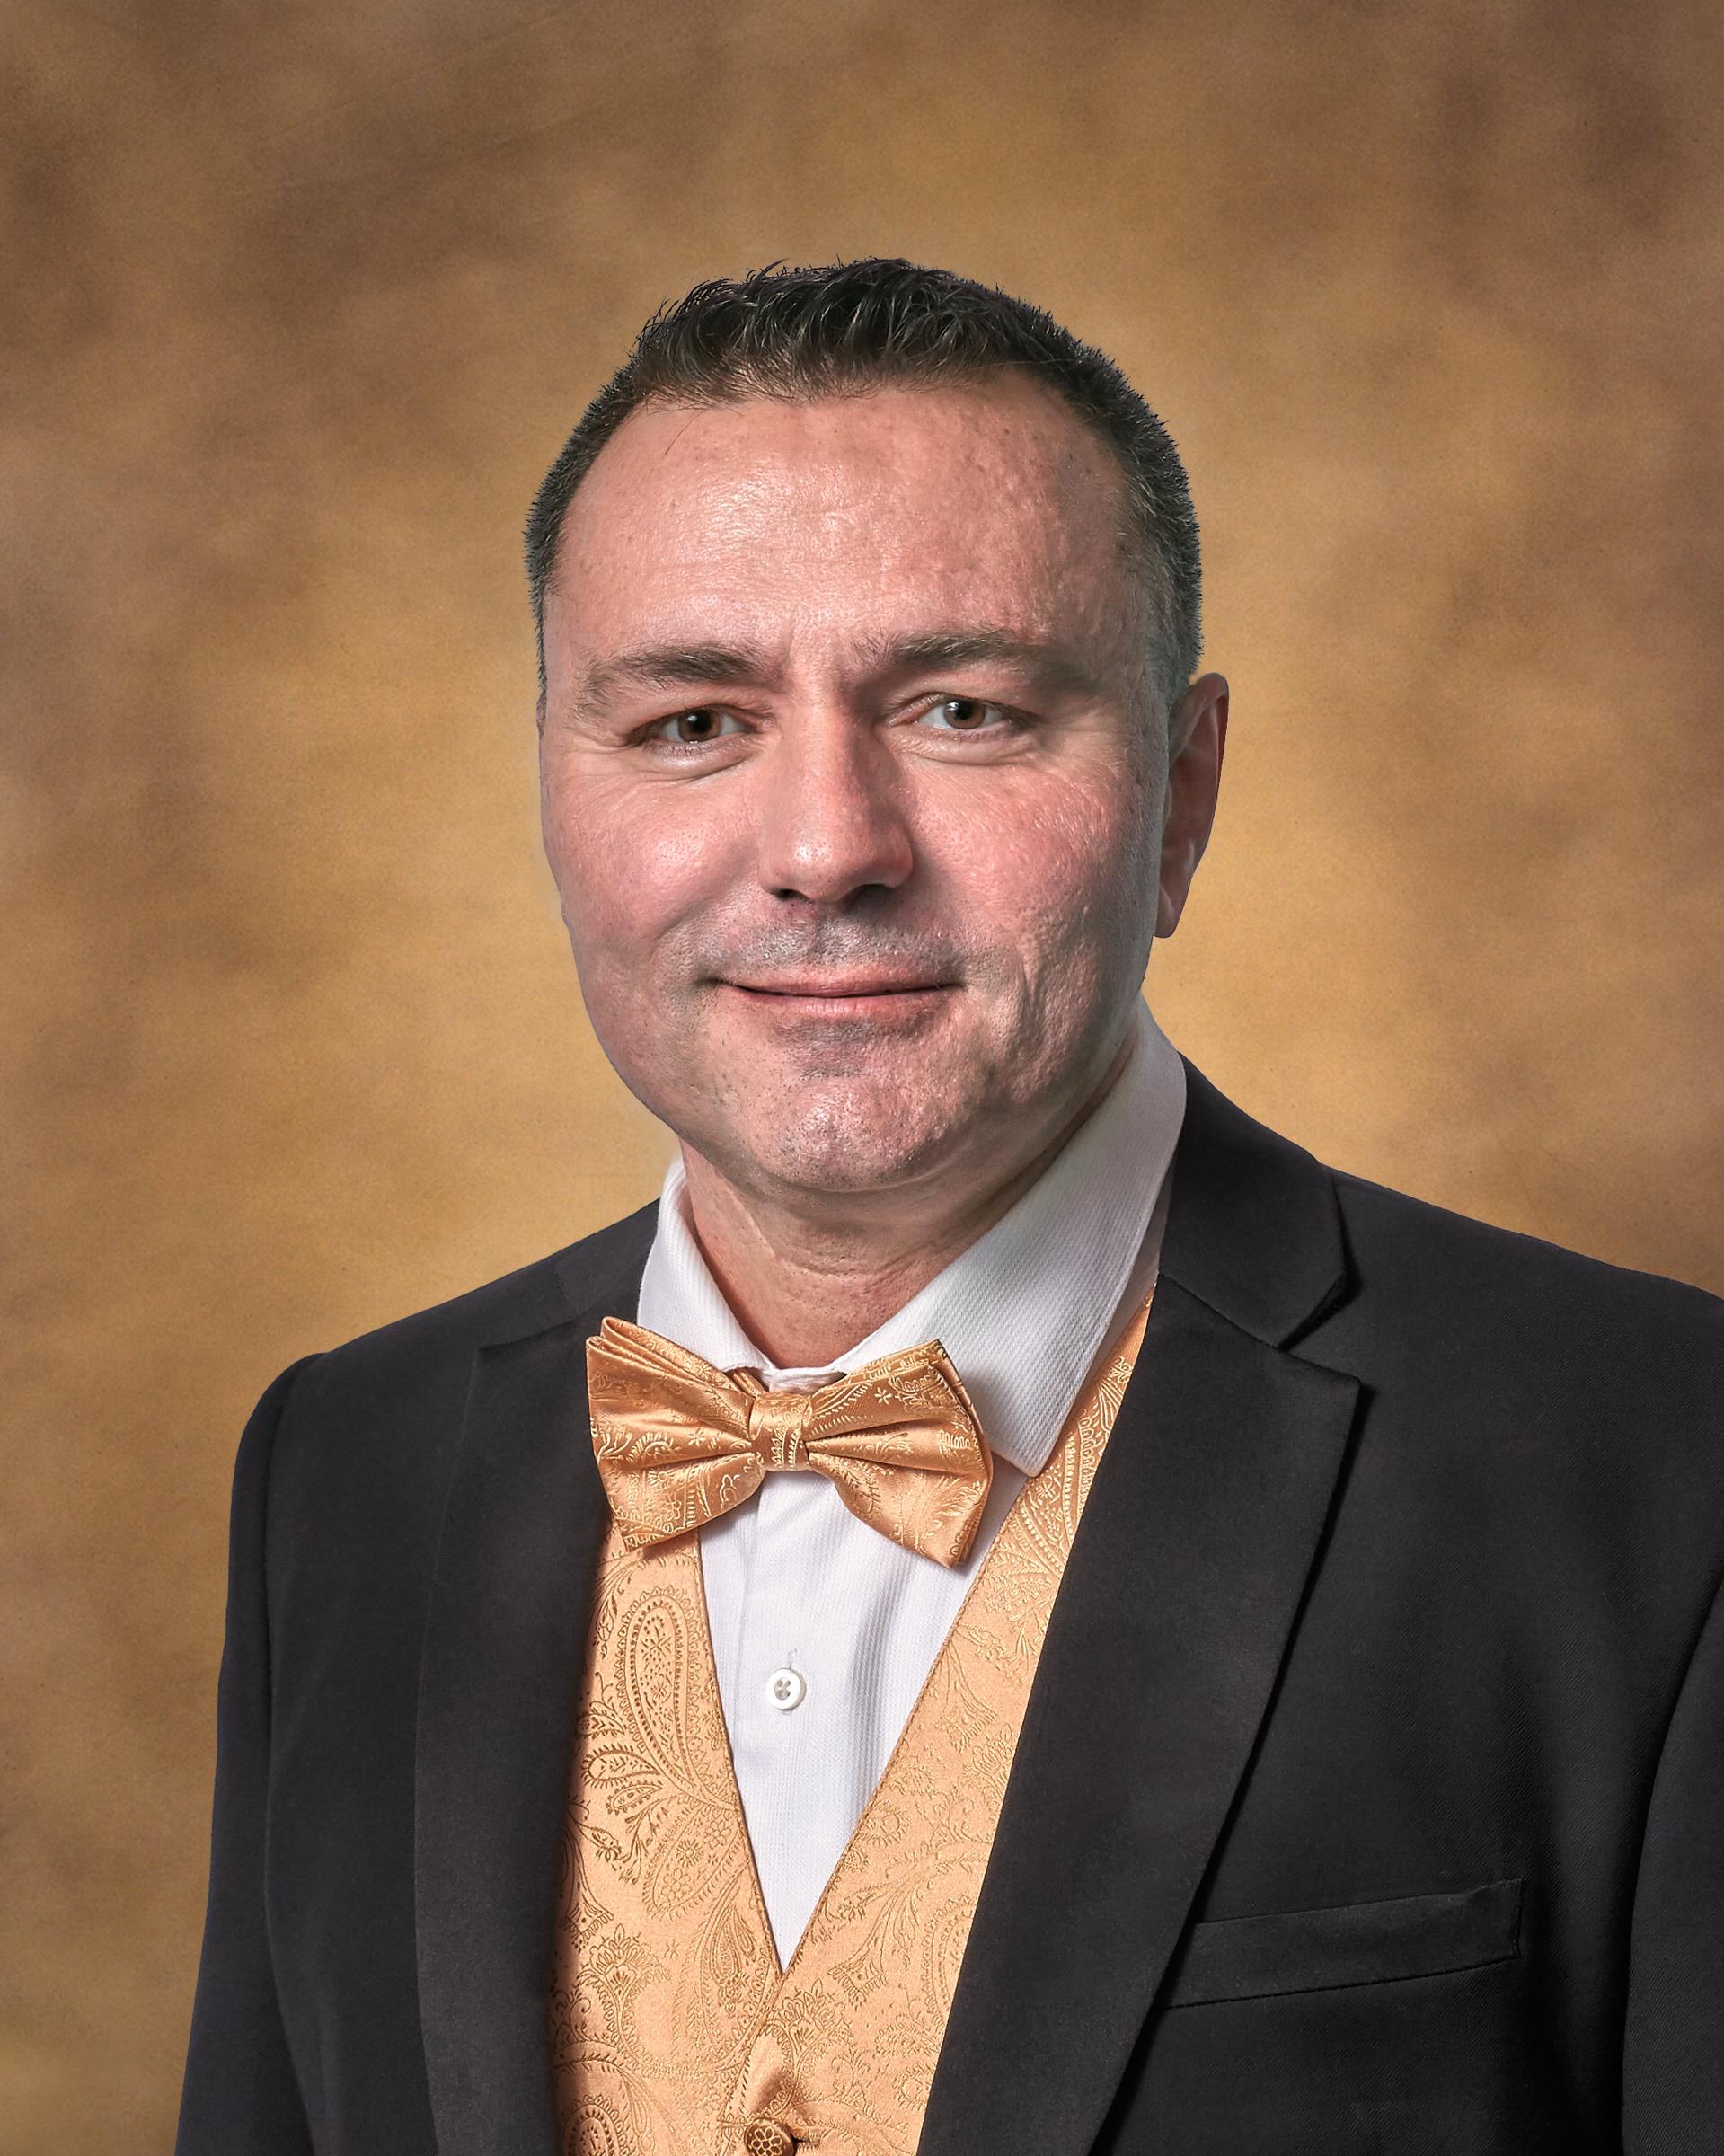 Robert Grbavac